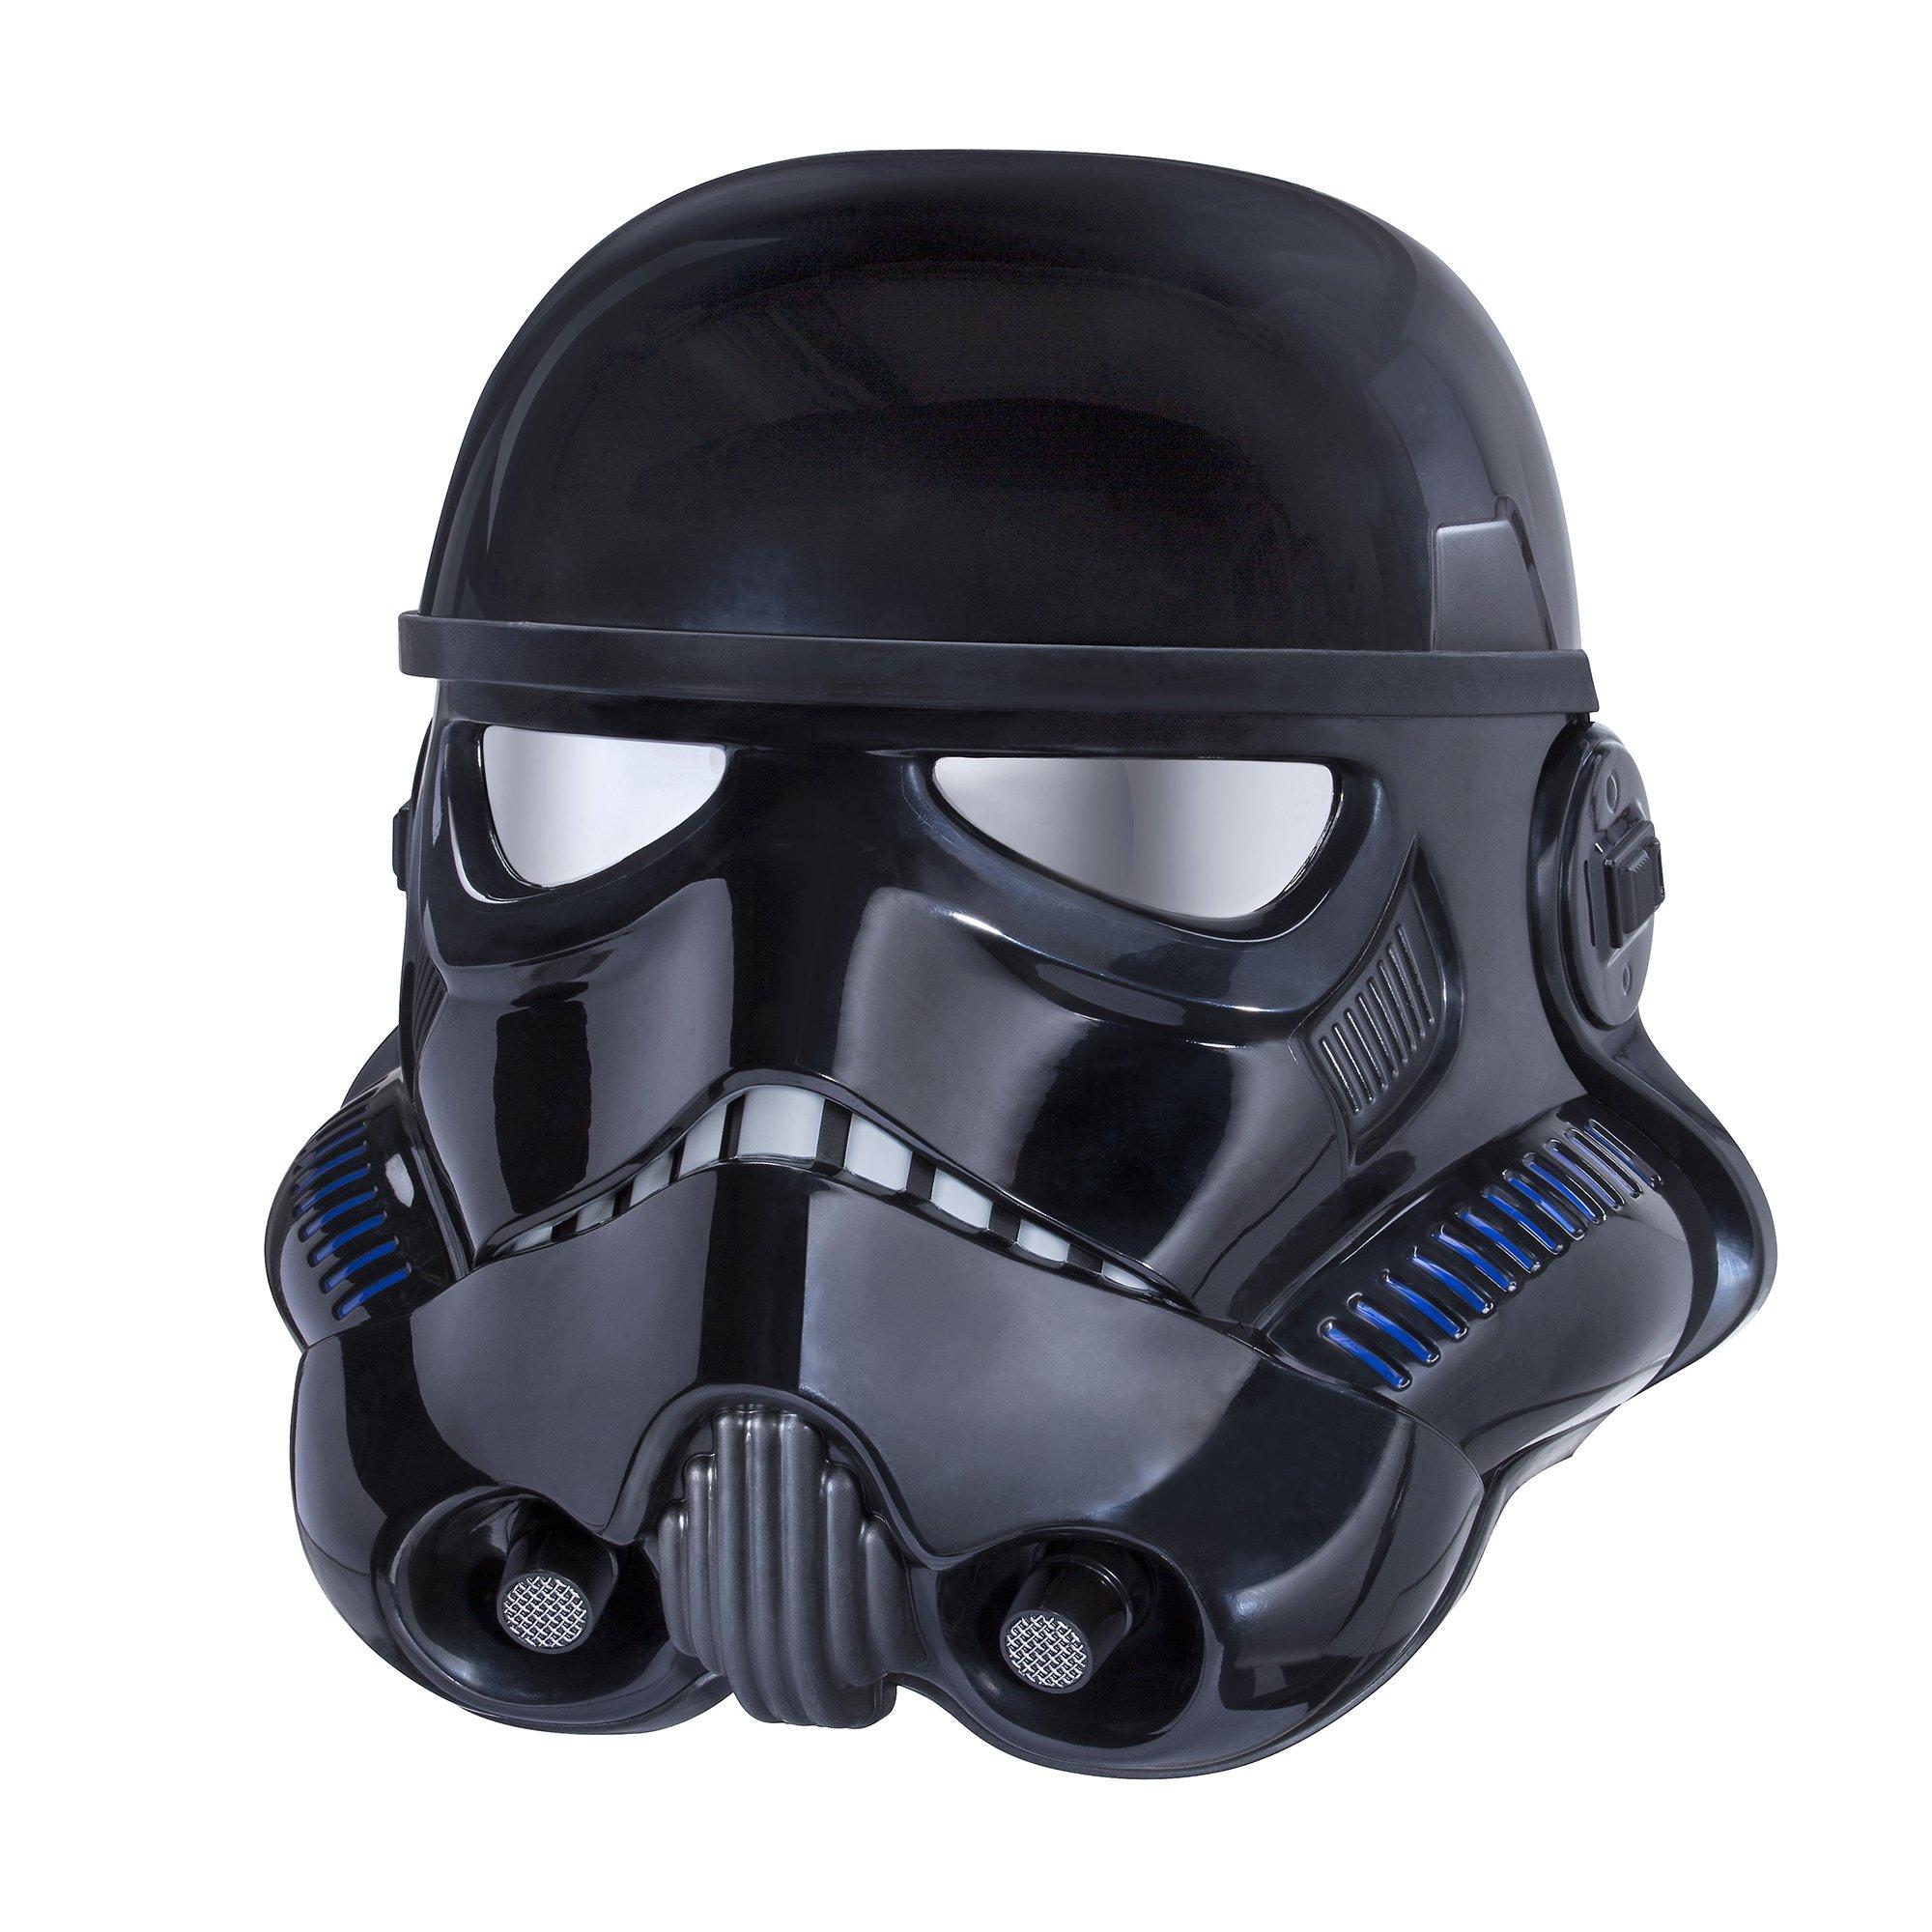 Star Wars The Black Series Shadow Trooper Electronic Helmet (Amazon Exclusive)